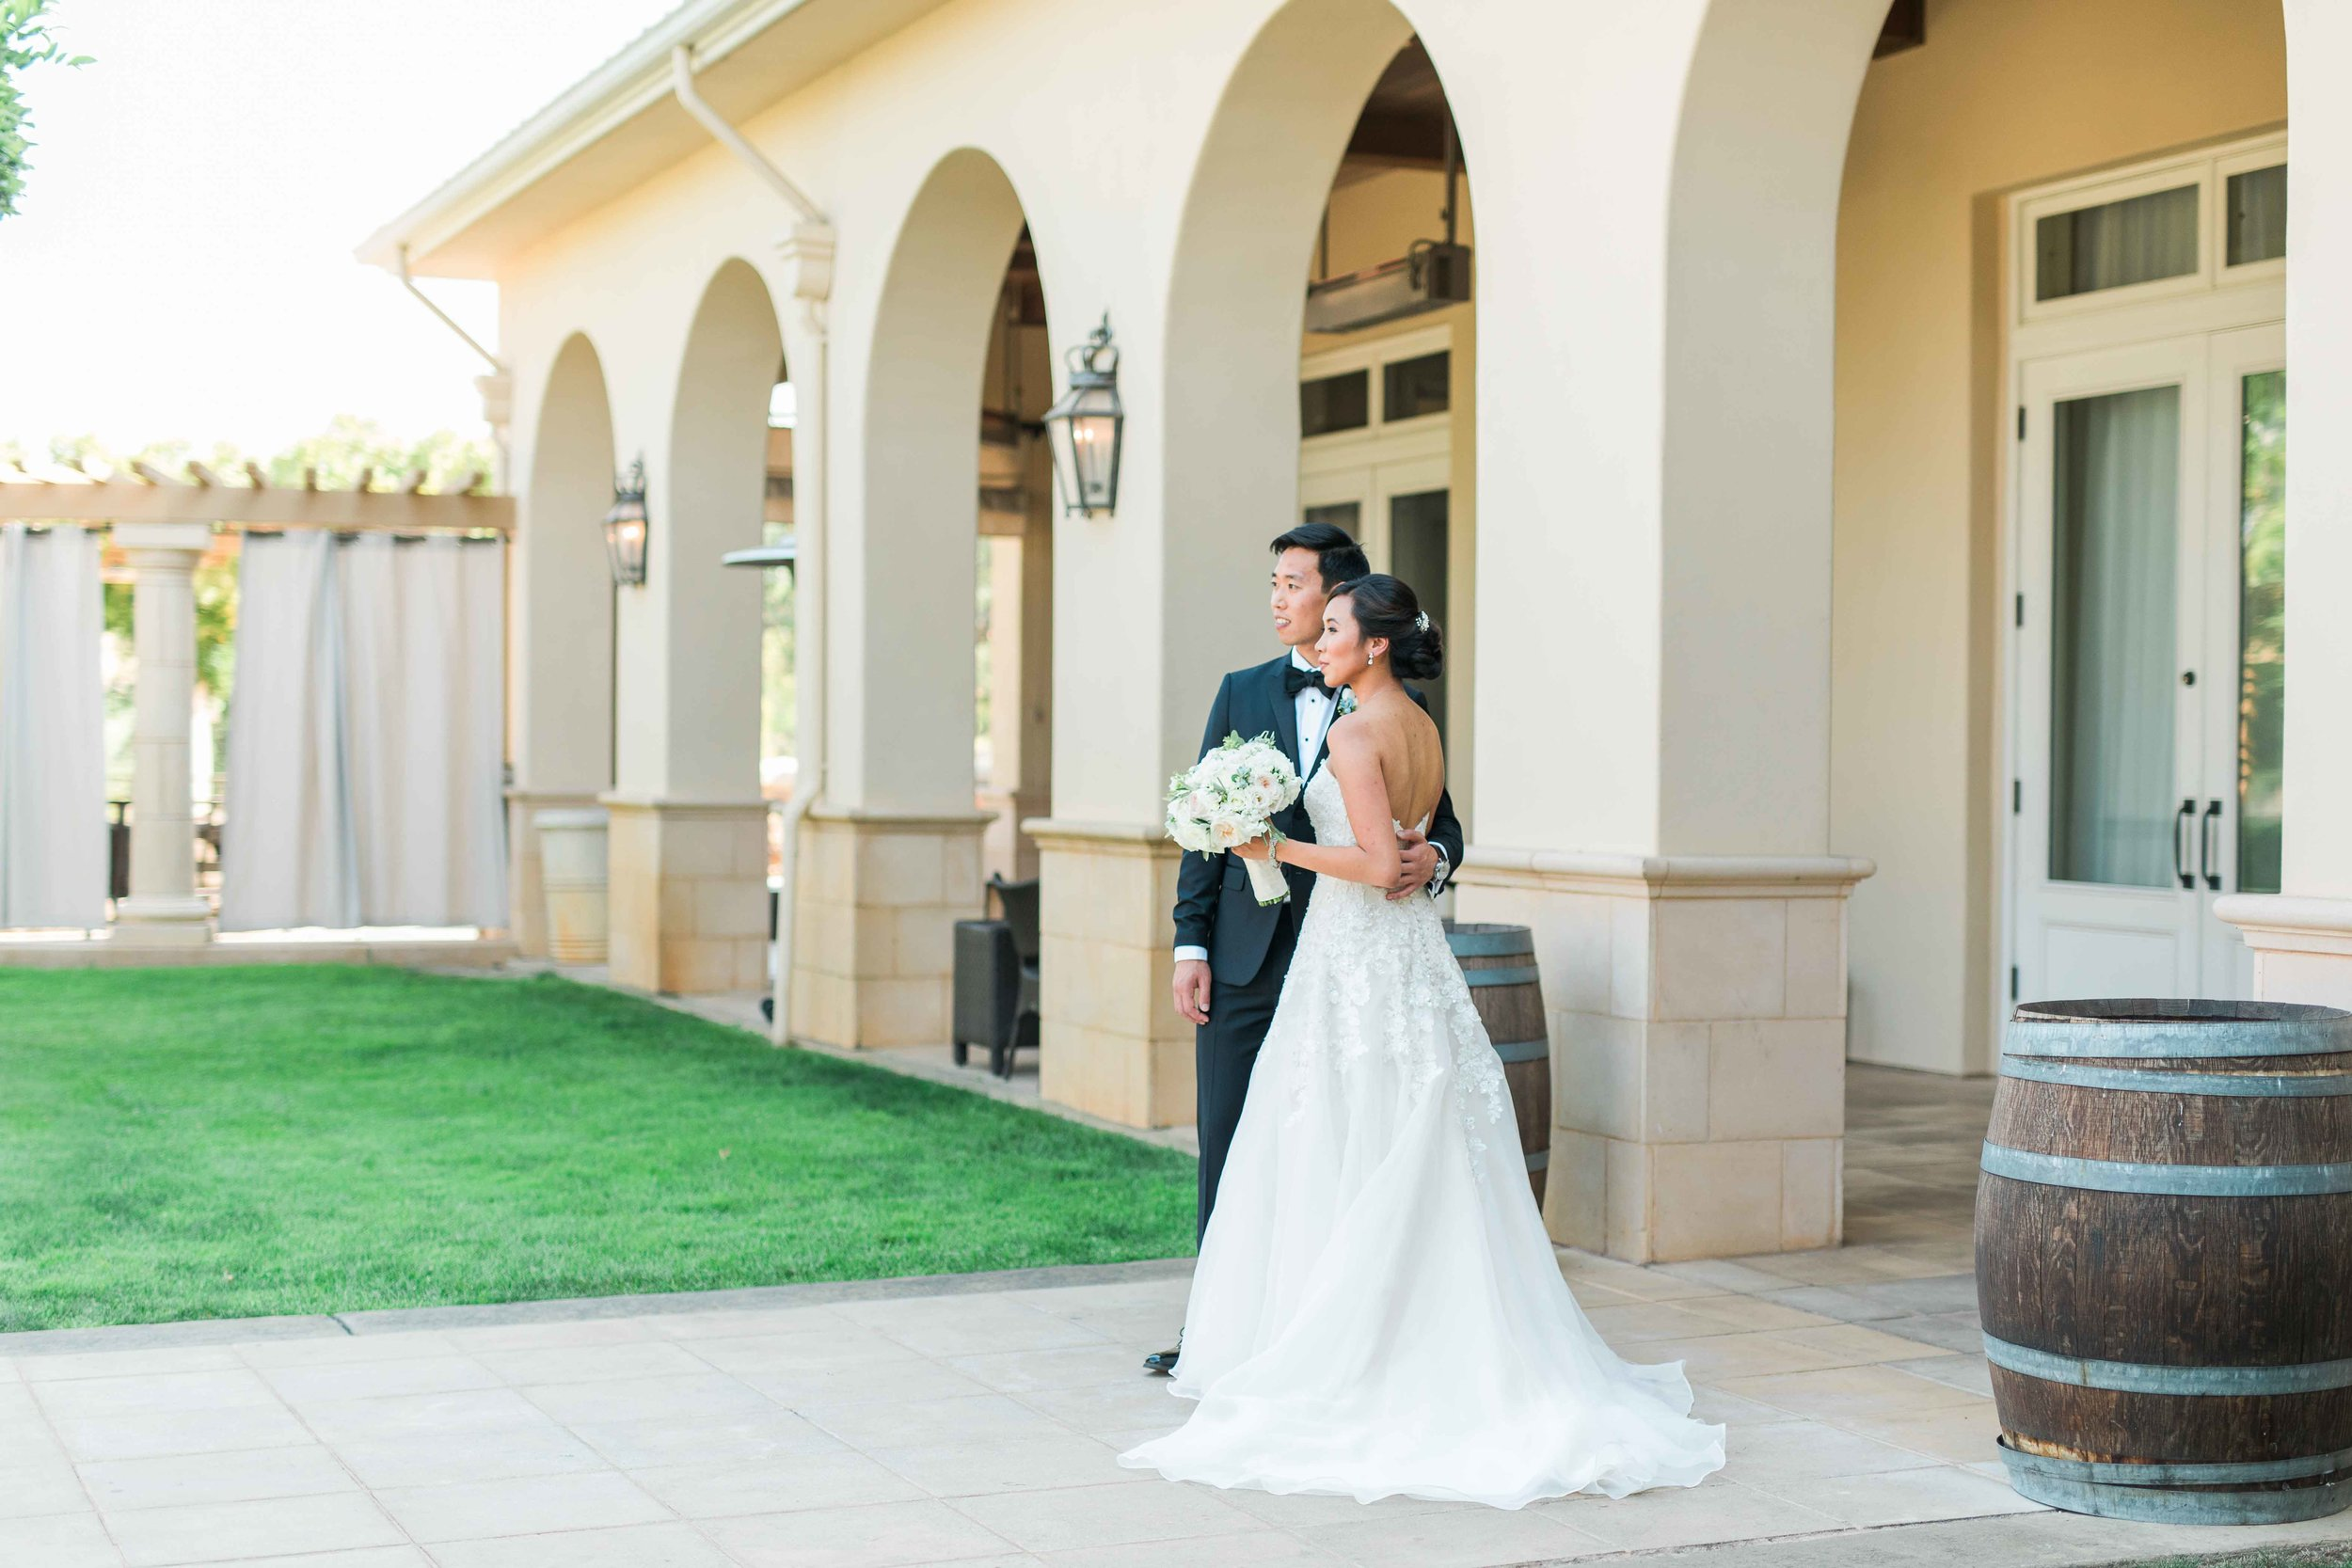 Ruby Hill Wedding Photos by JBJ Pictures - San Francisco Wedding Photographer - Pleasanton Wedding Venue (29).jpg